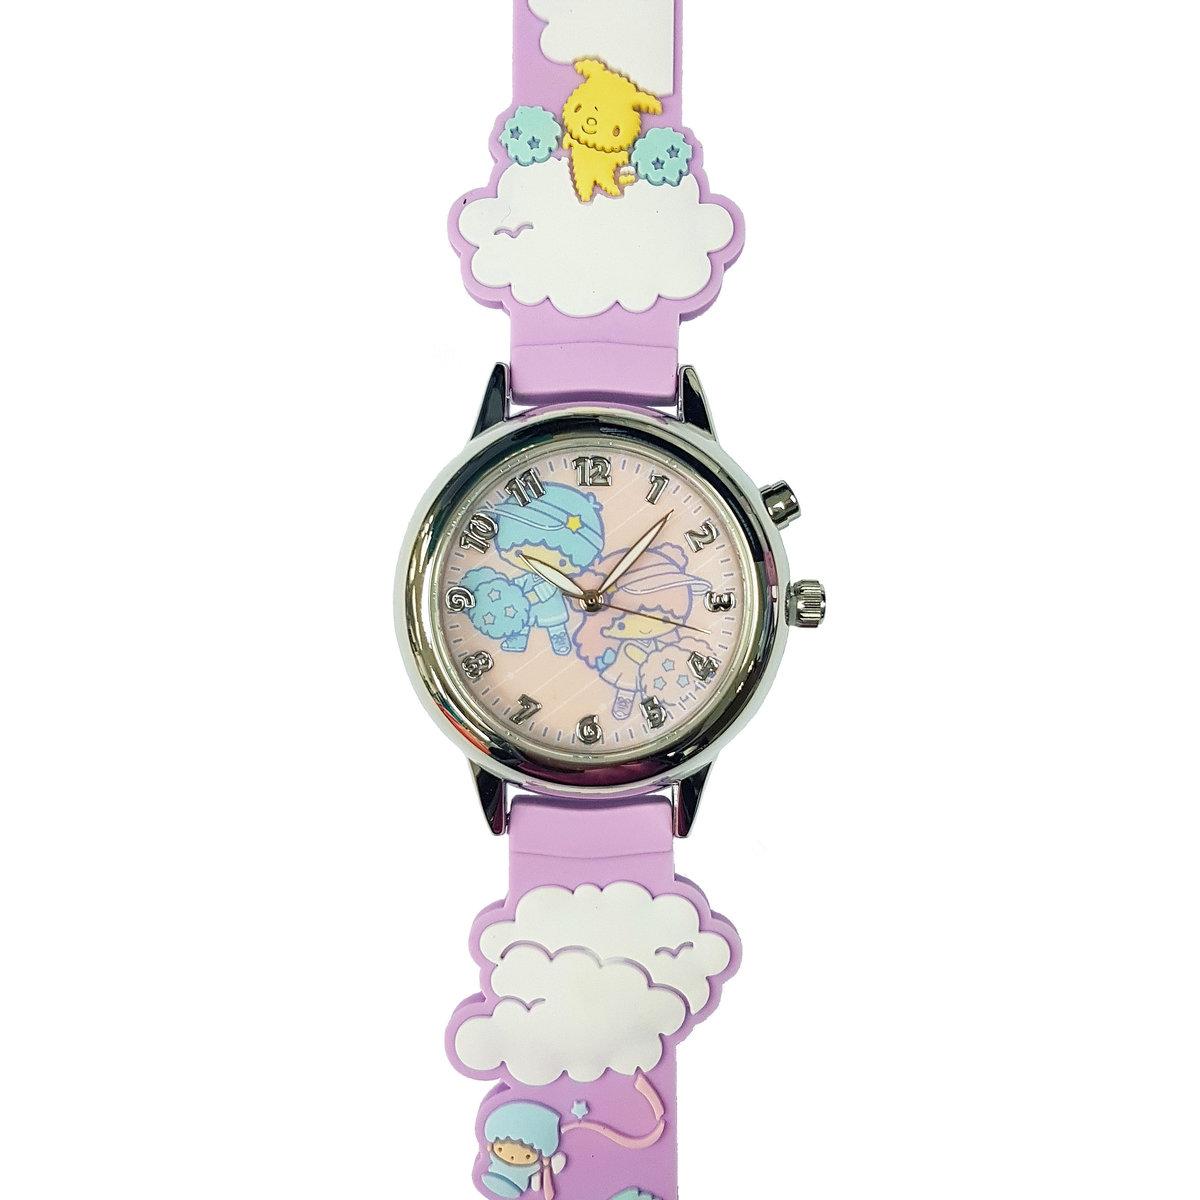 SANRIO - Little Twin Stars light up quartz watch (Purple)